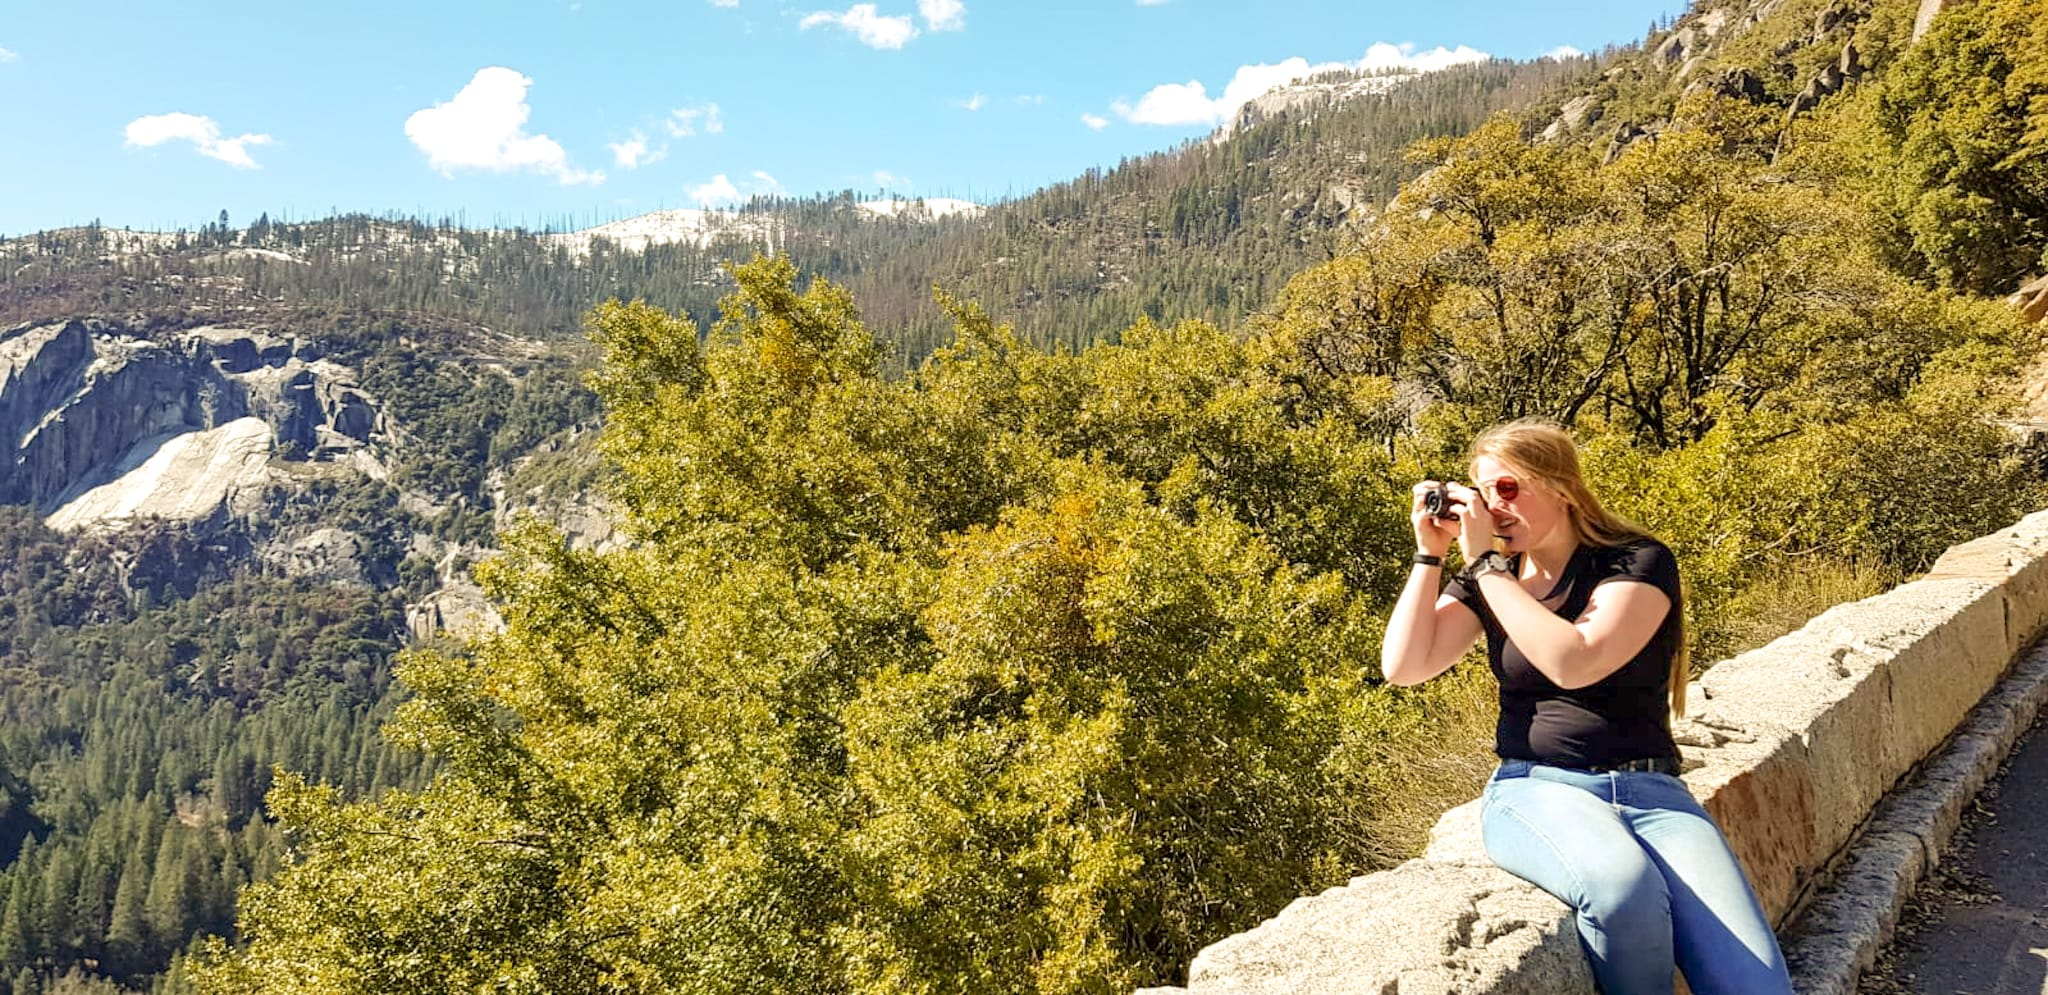 Joanne in Yosemite National Park, Amerika | Tips om te beginnen met fotograferen